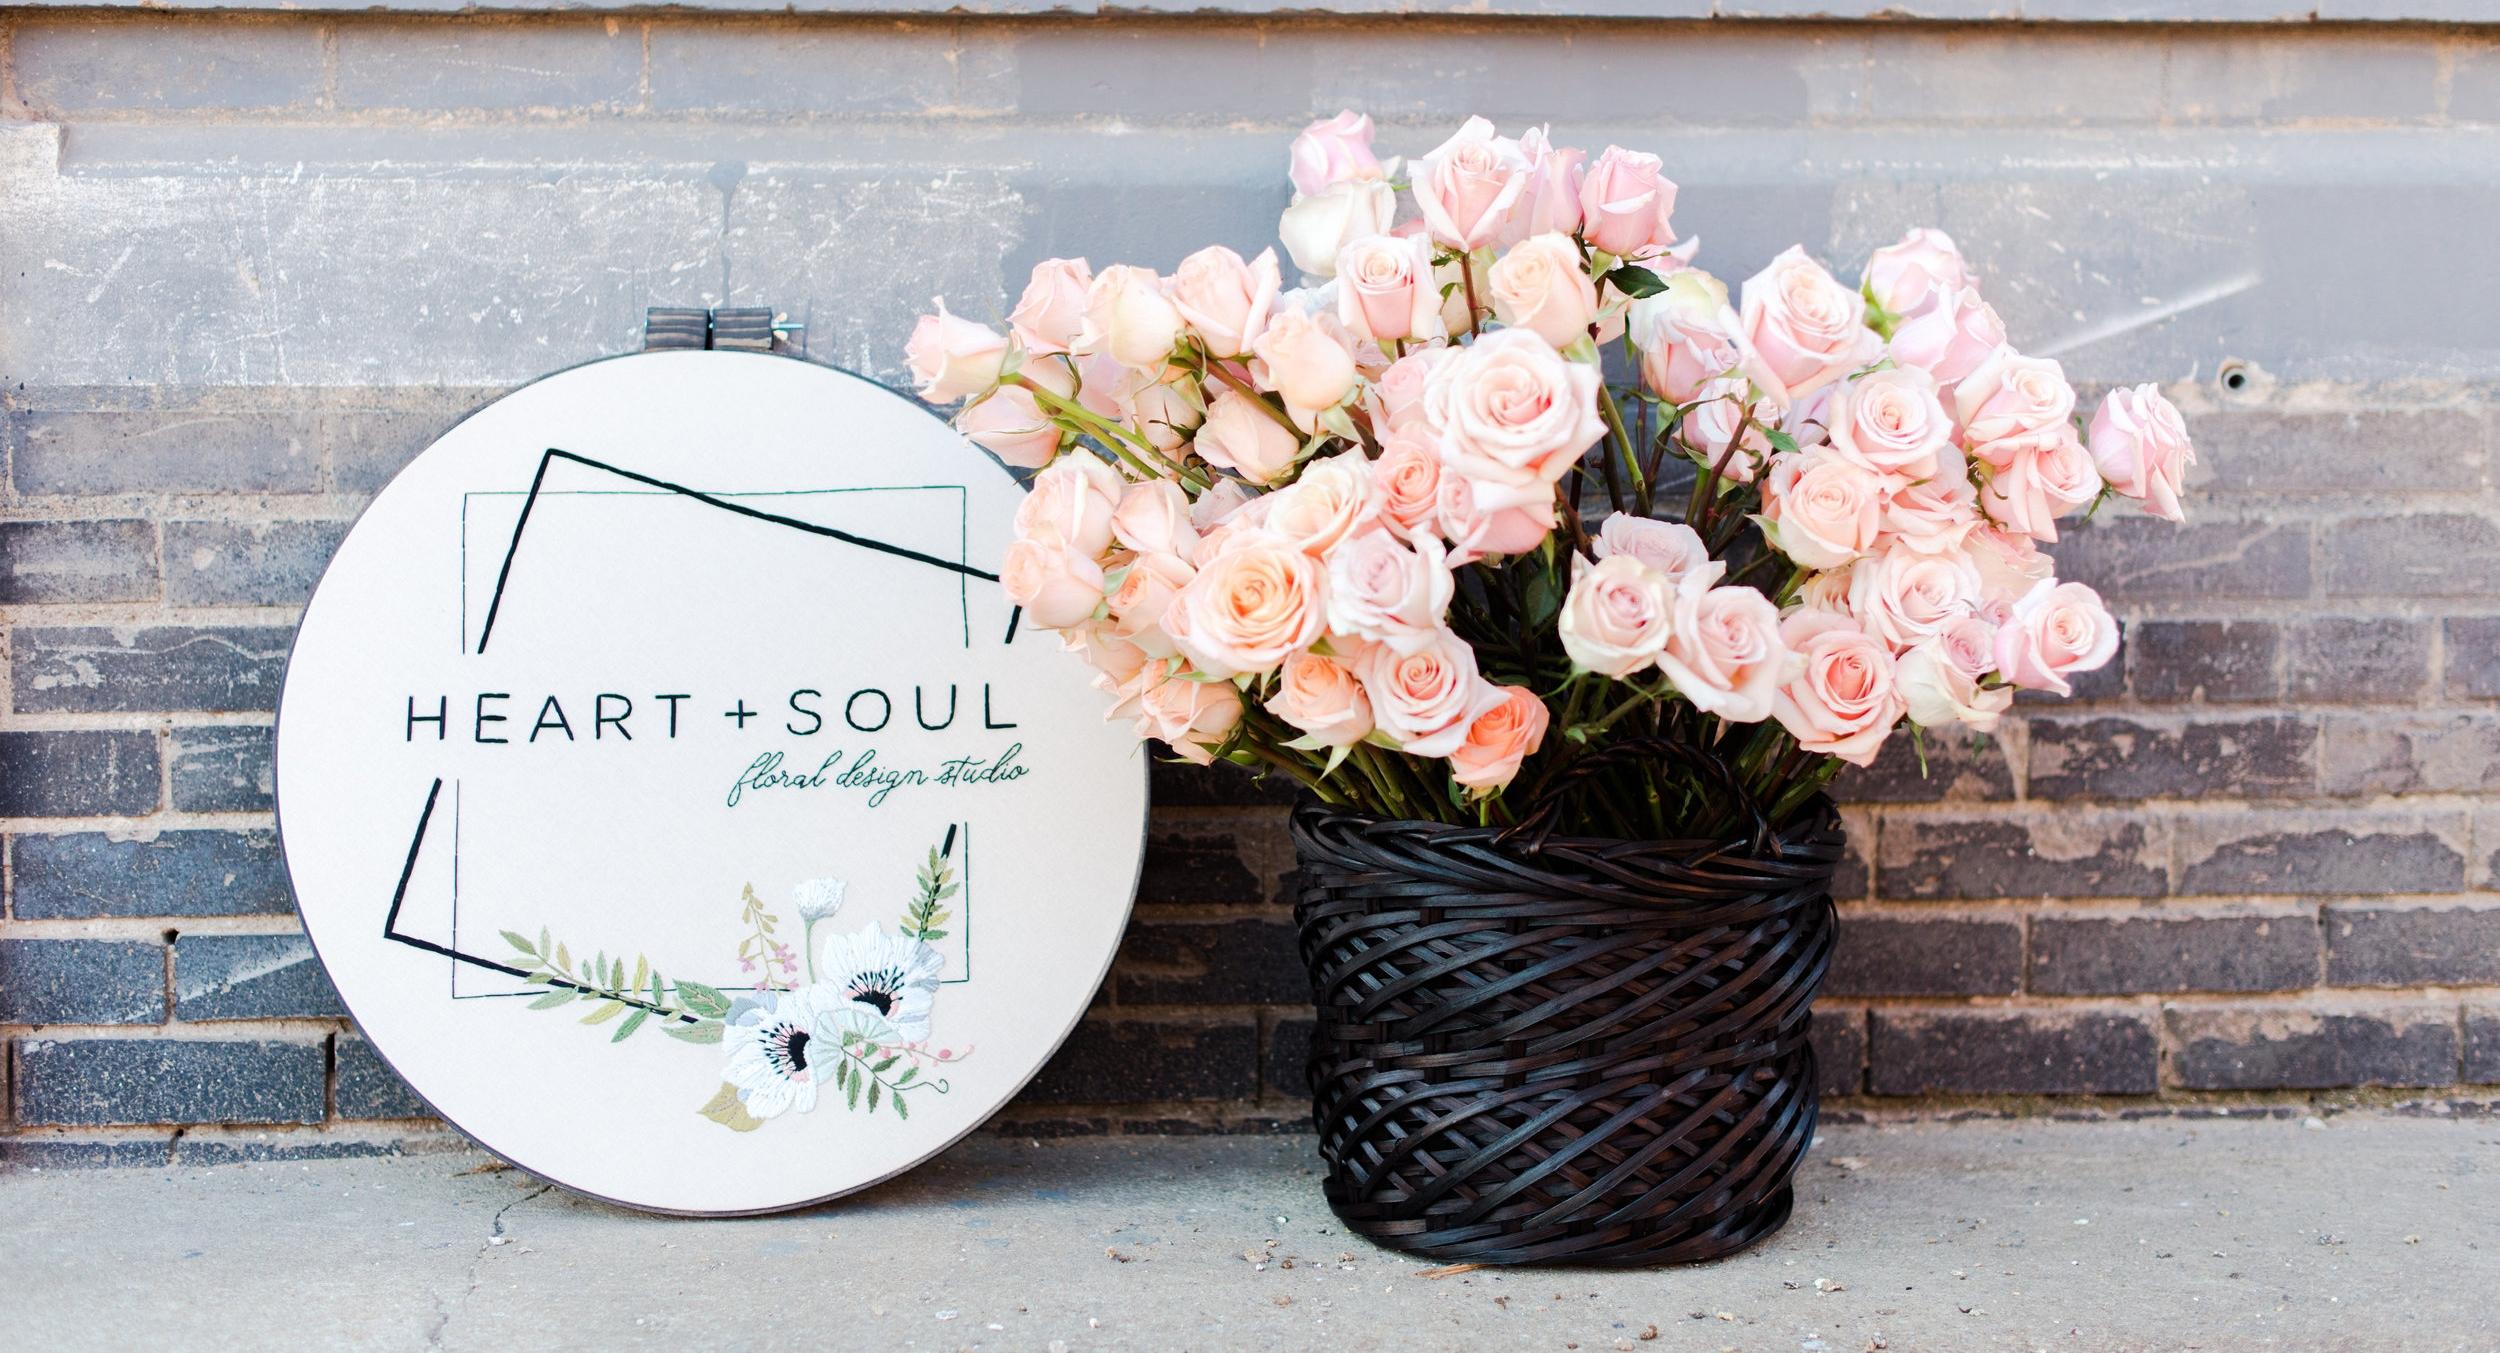 Kansas City wedding florist Heart + Soul